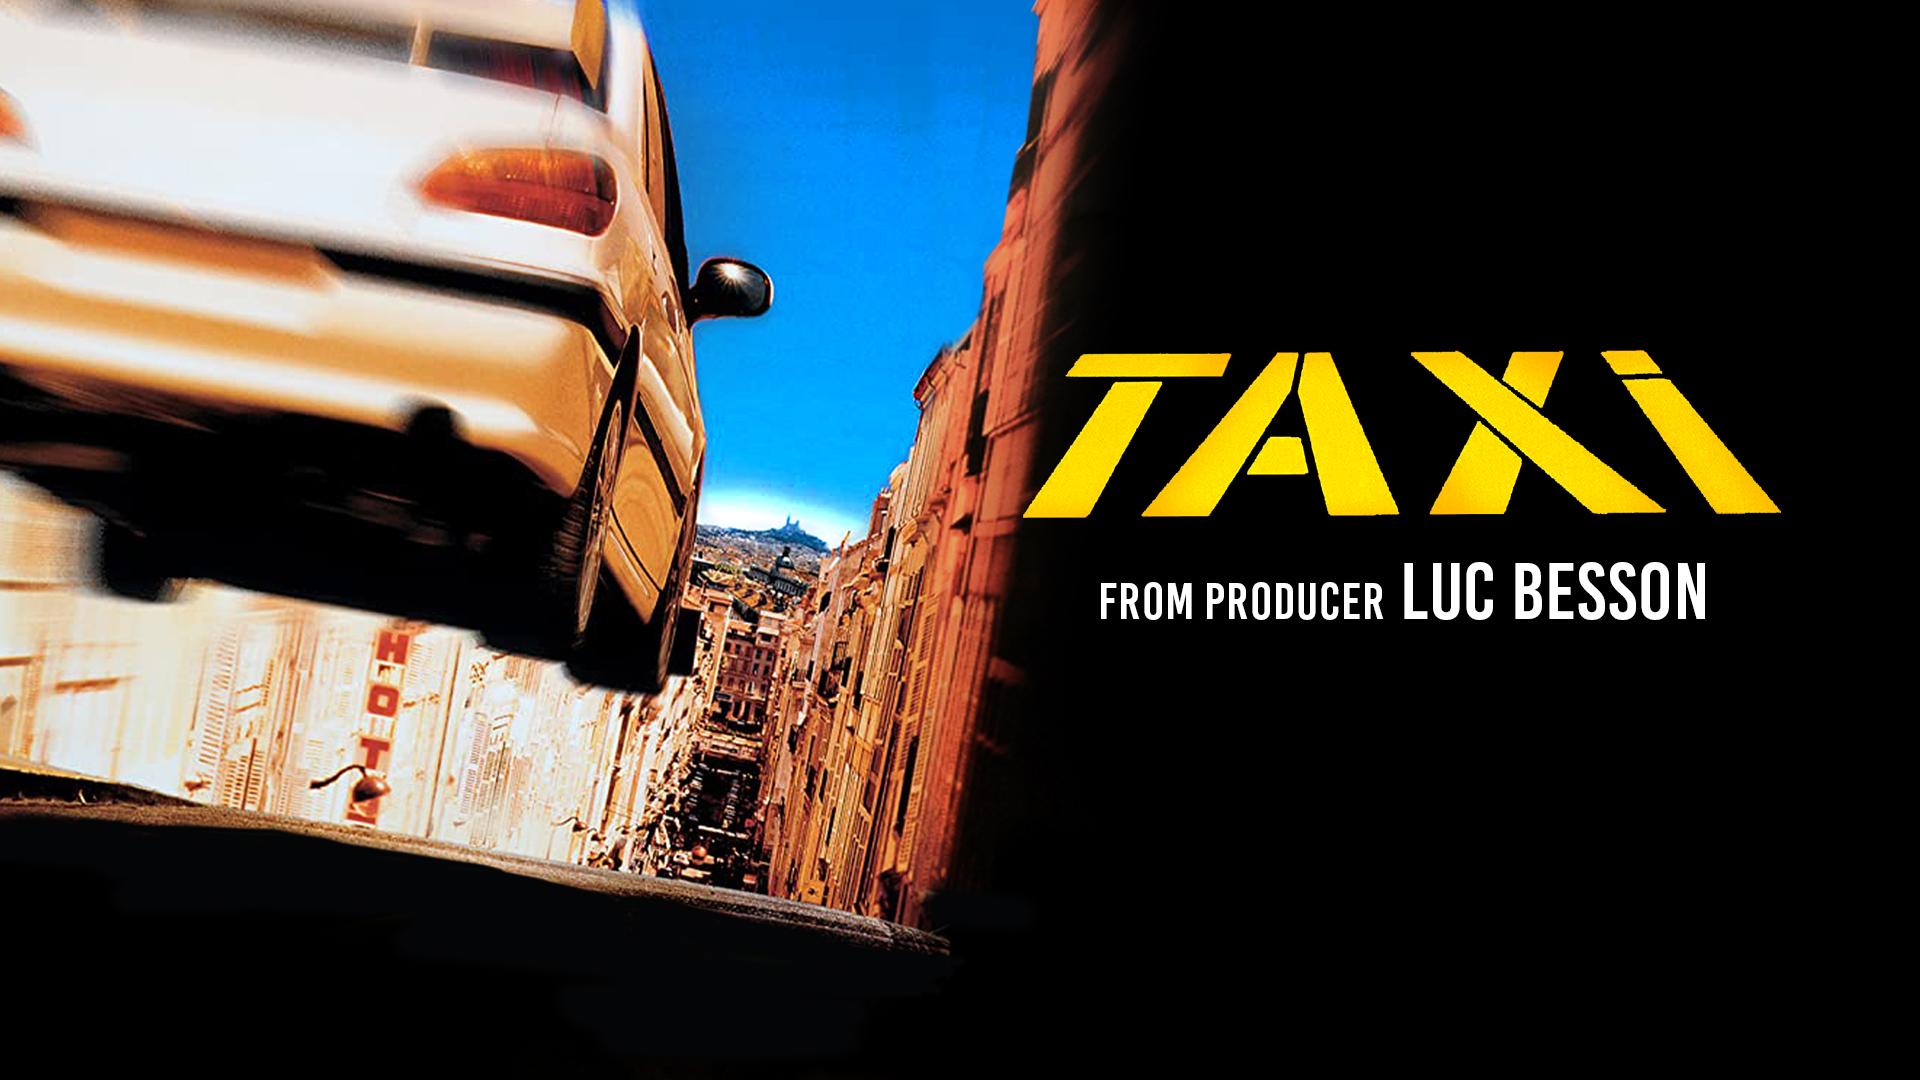 Taxi on Amazon Prime Video UK